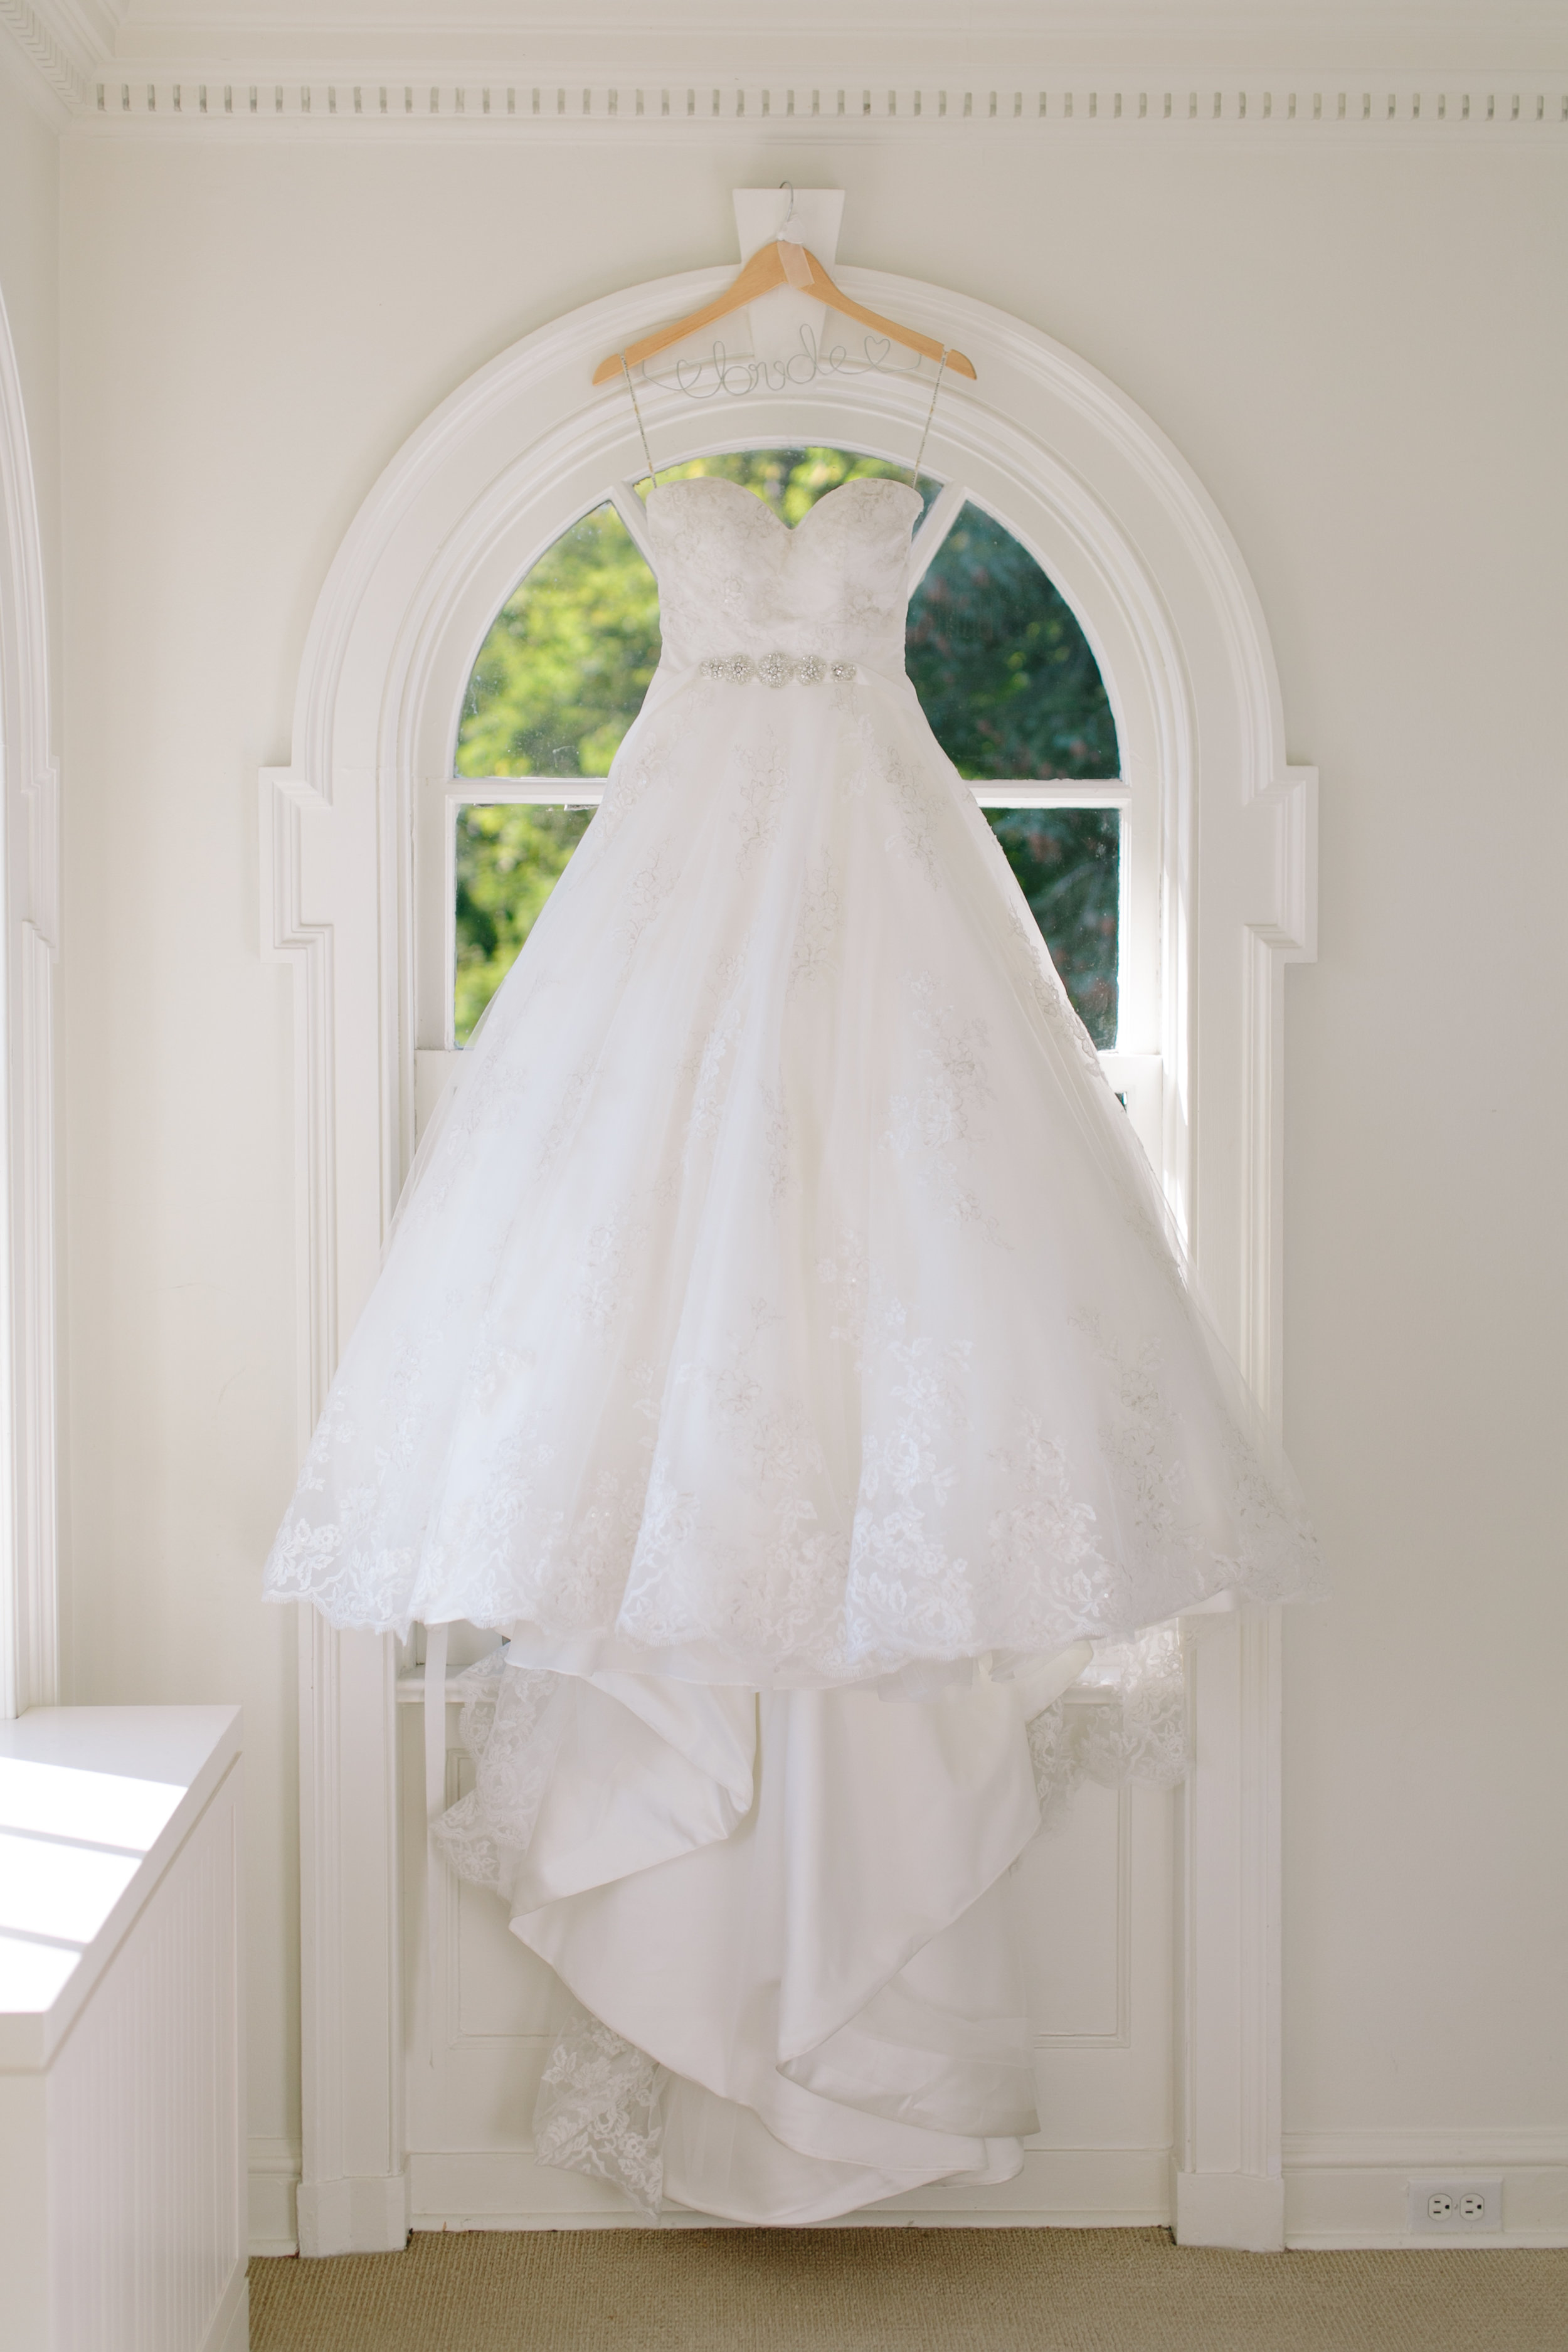 Phoebe Lo Events Toronto Wedding - Estates of Sunnybrook Rustic Event 001.jpg